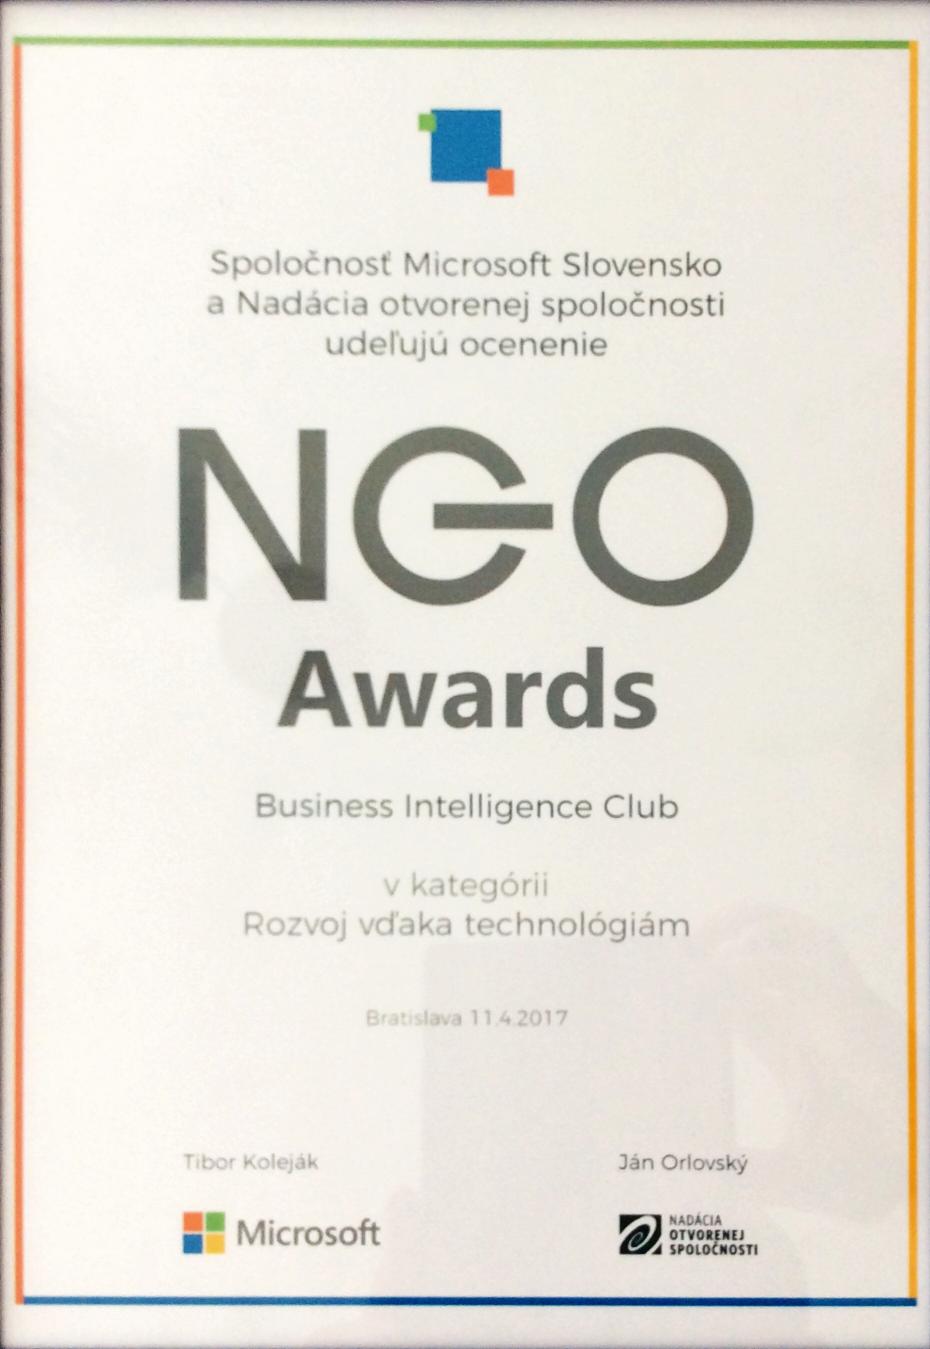 Business Intelligence Club, o. z. získal ocenie NGO Awards 2017 za technológie využívané pre Prohuman, Prosurvey, Projustice